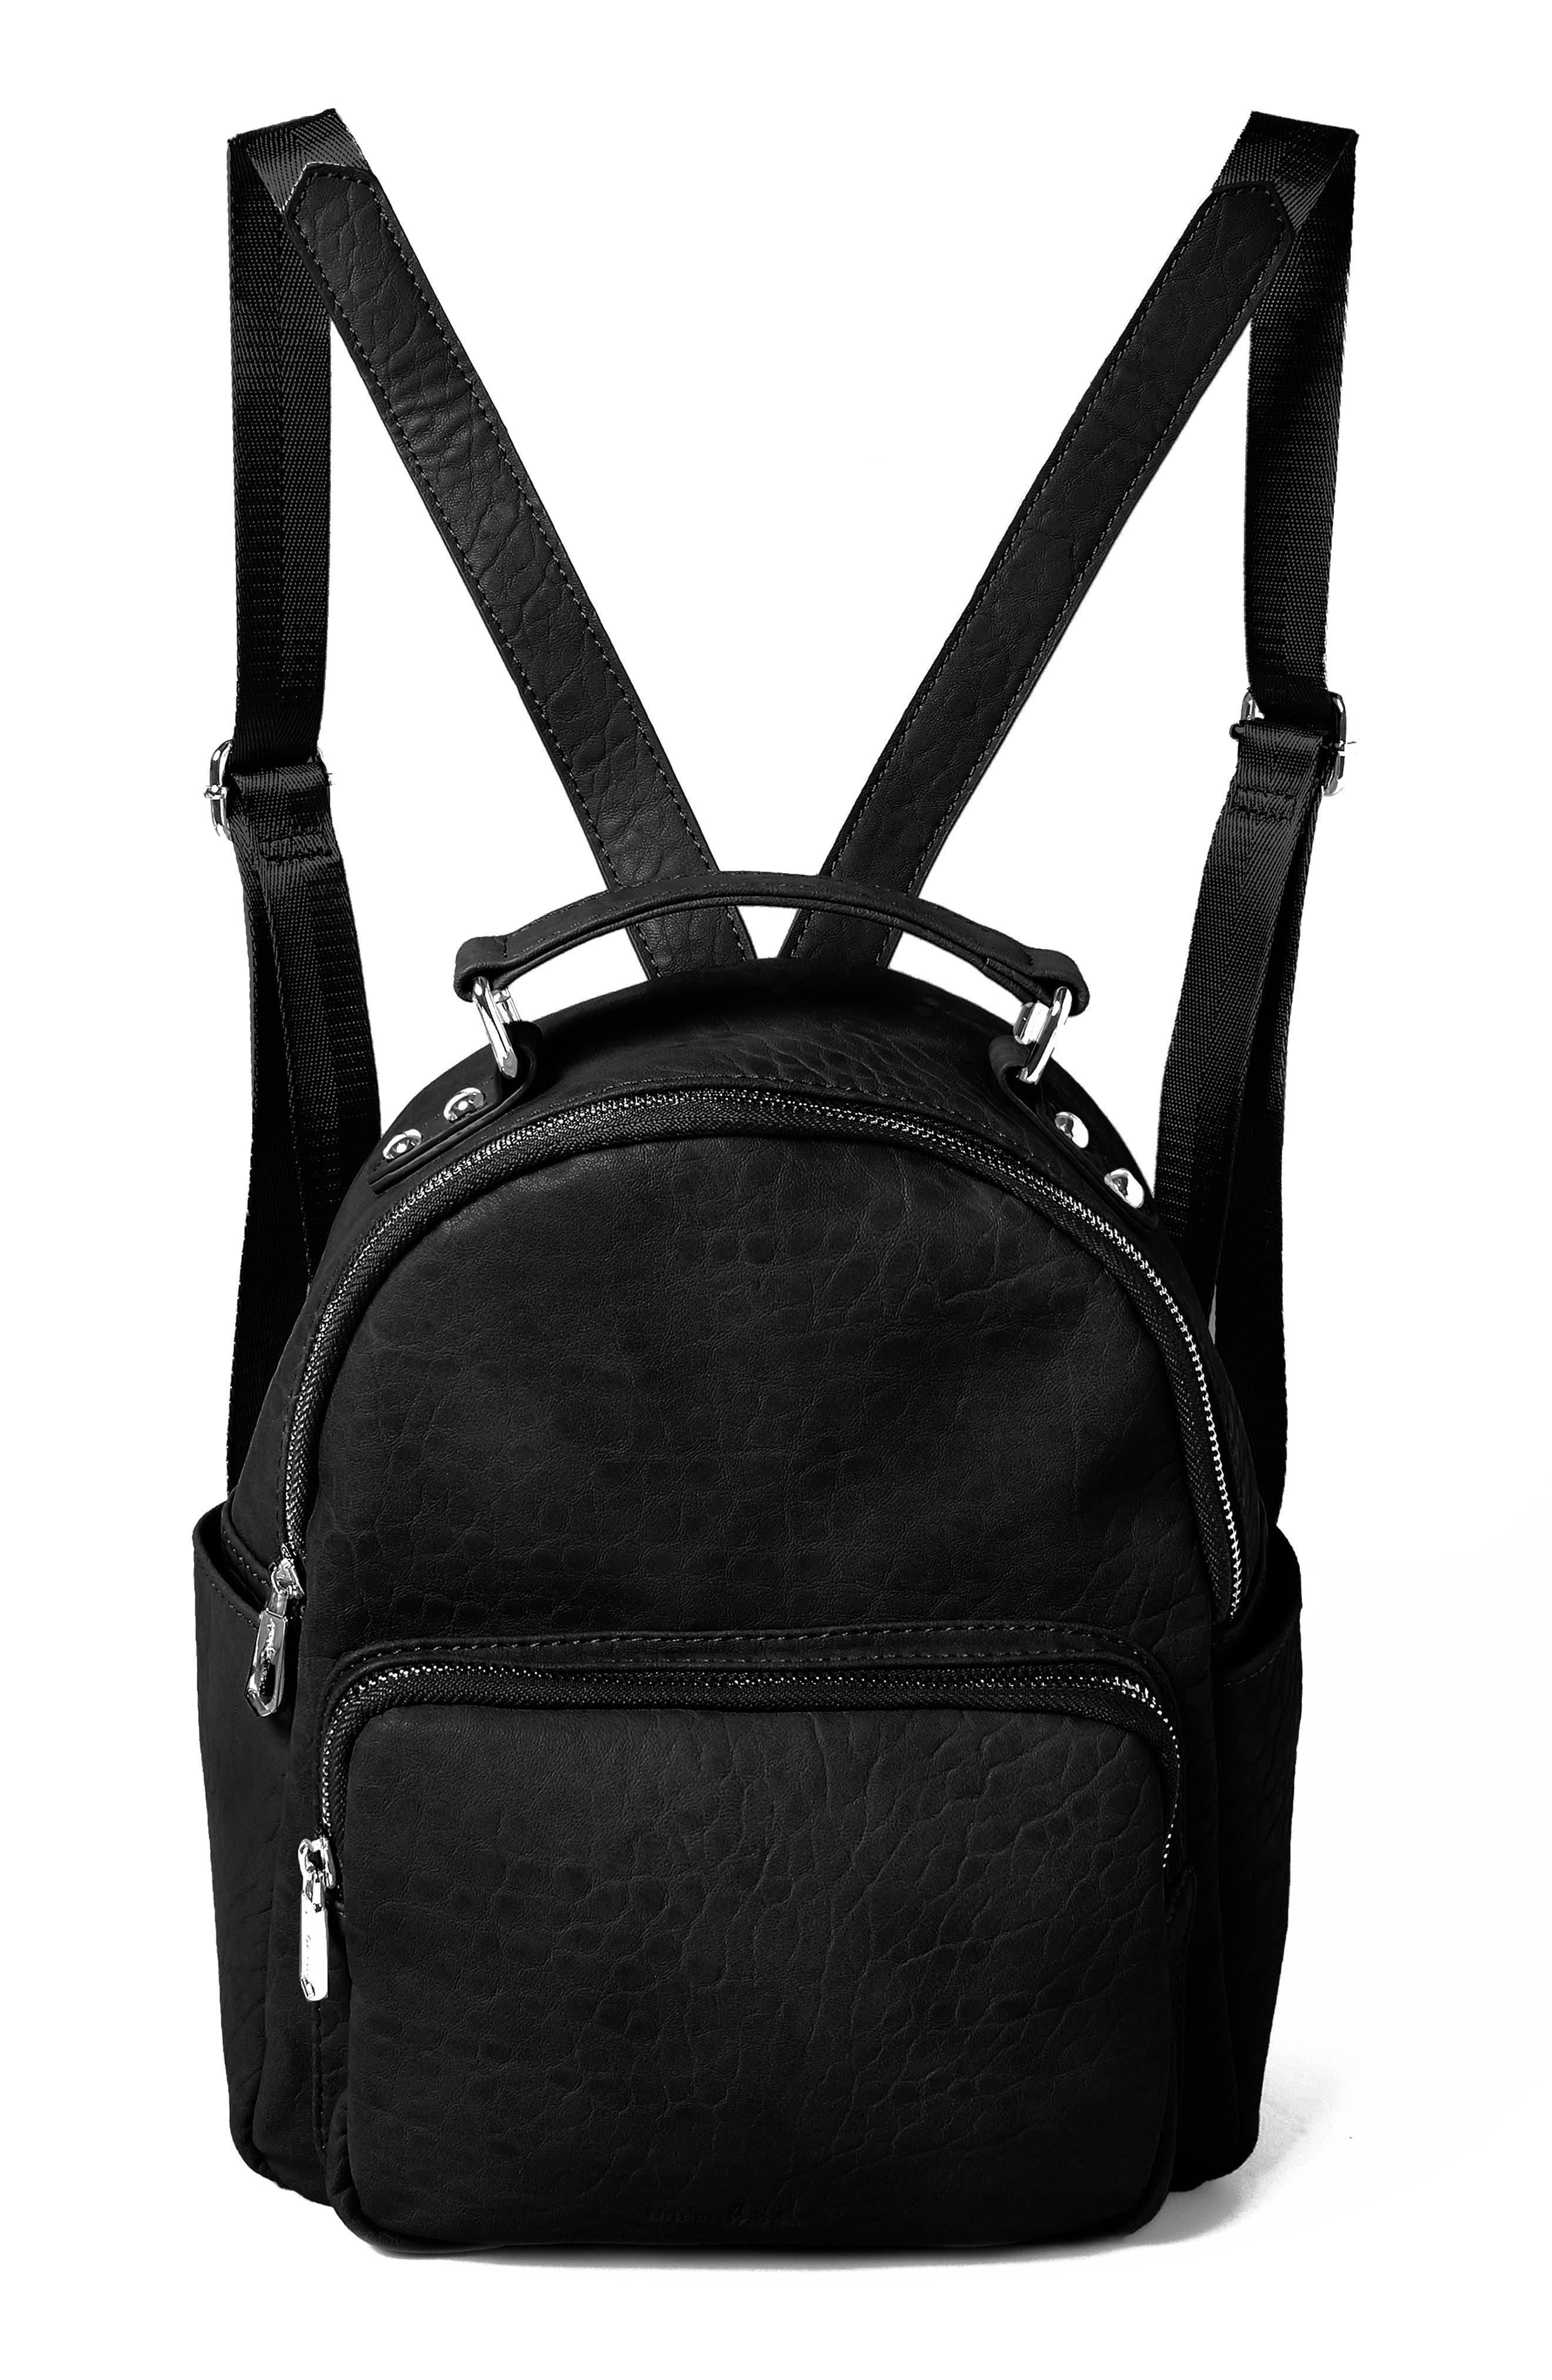 Vegan Leather Mini Backpack - Black